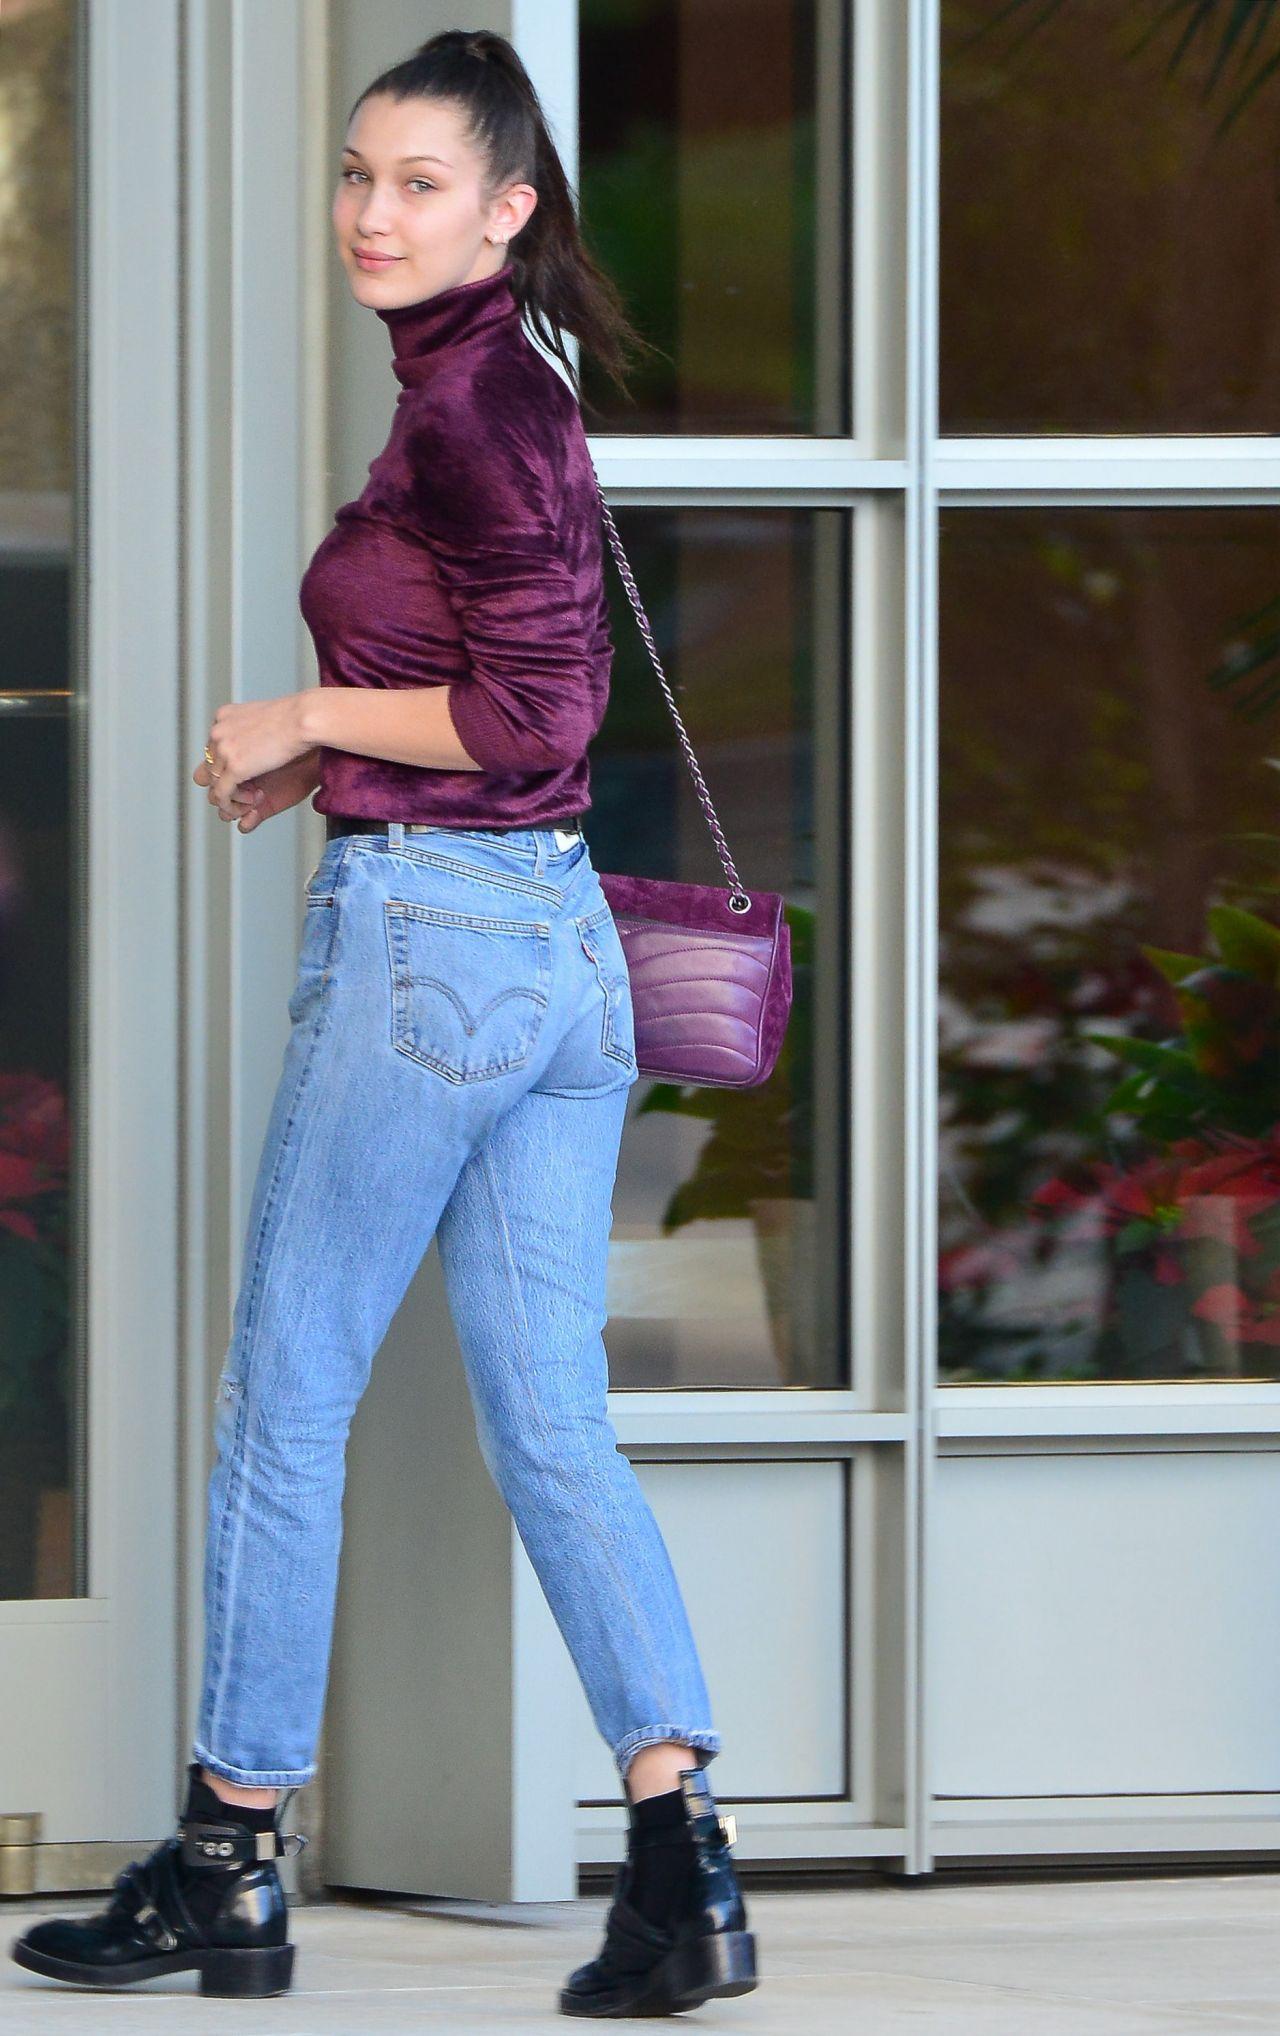 Bella Hadid Booty in J... Cate Blanchett